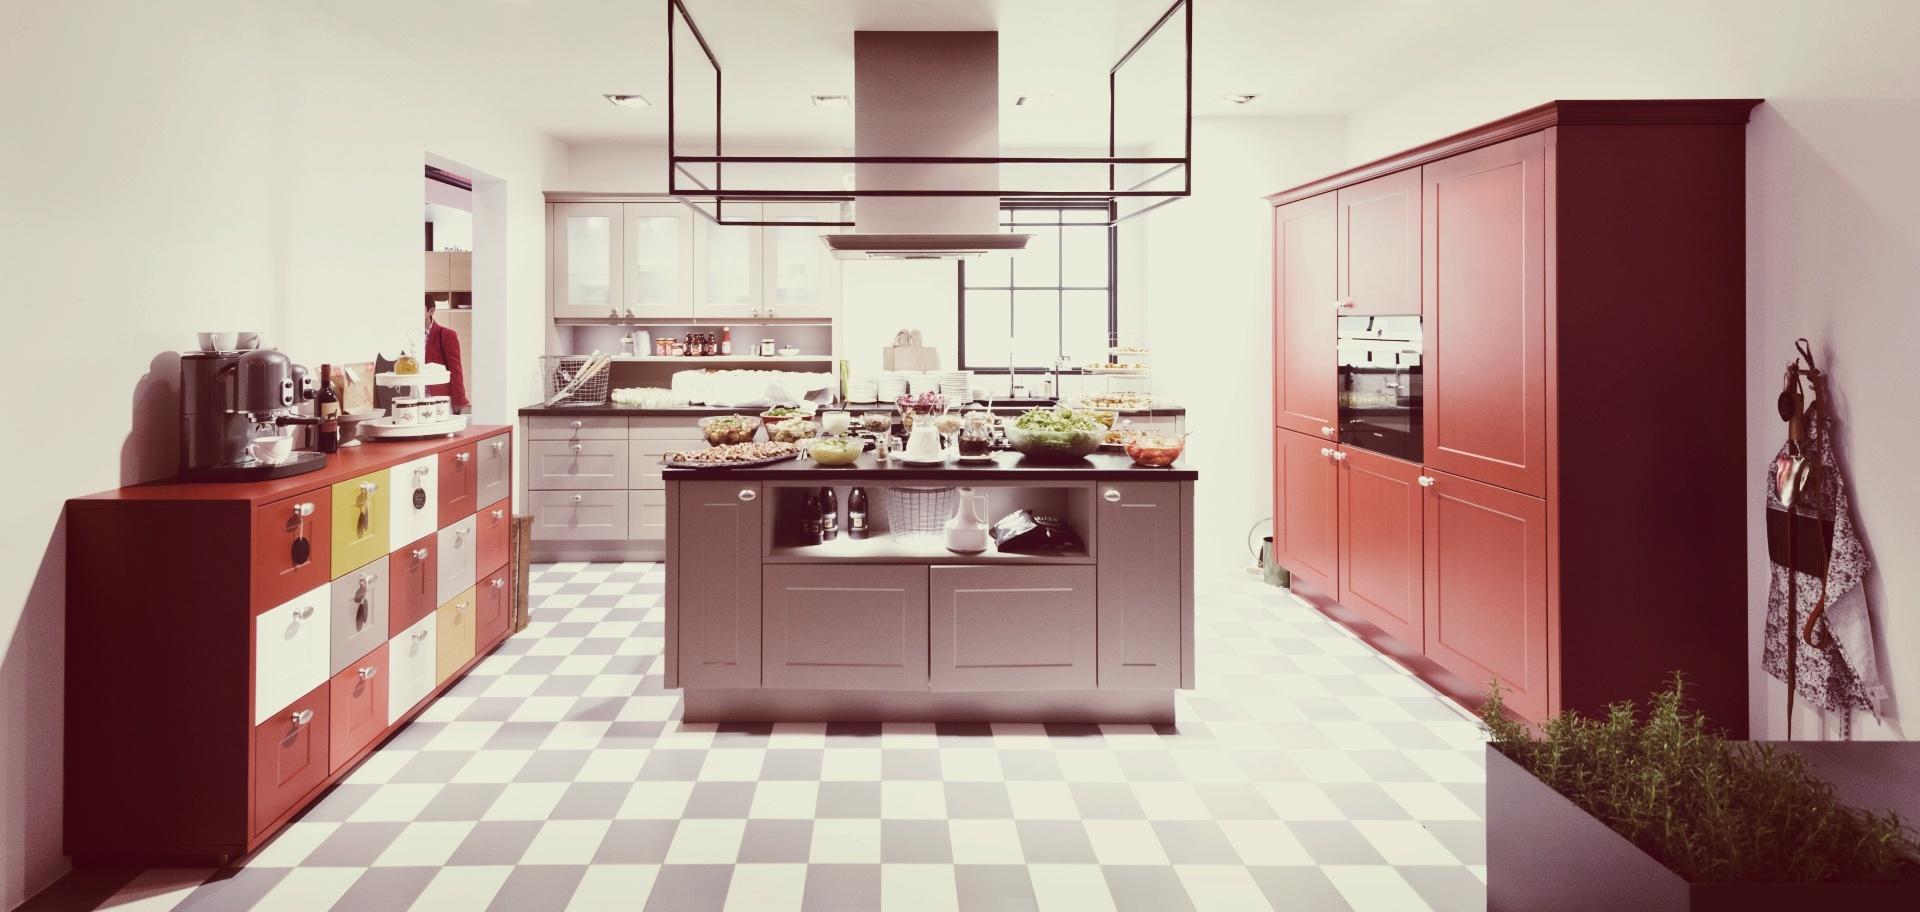 Kompakte Kuchen Designs Funktionalitat Komfort